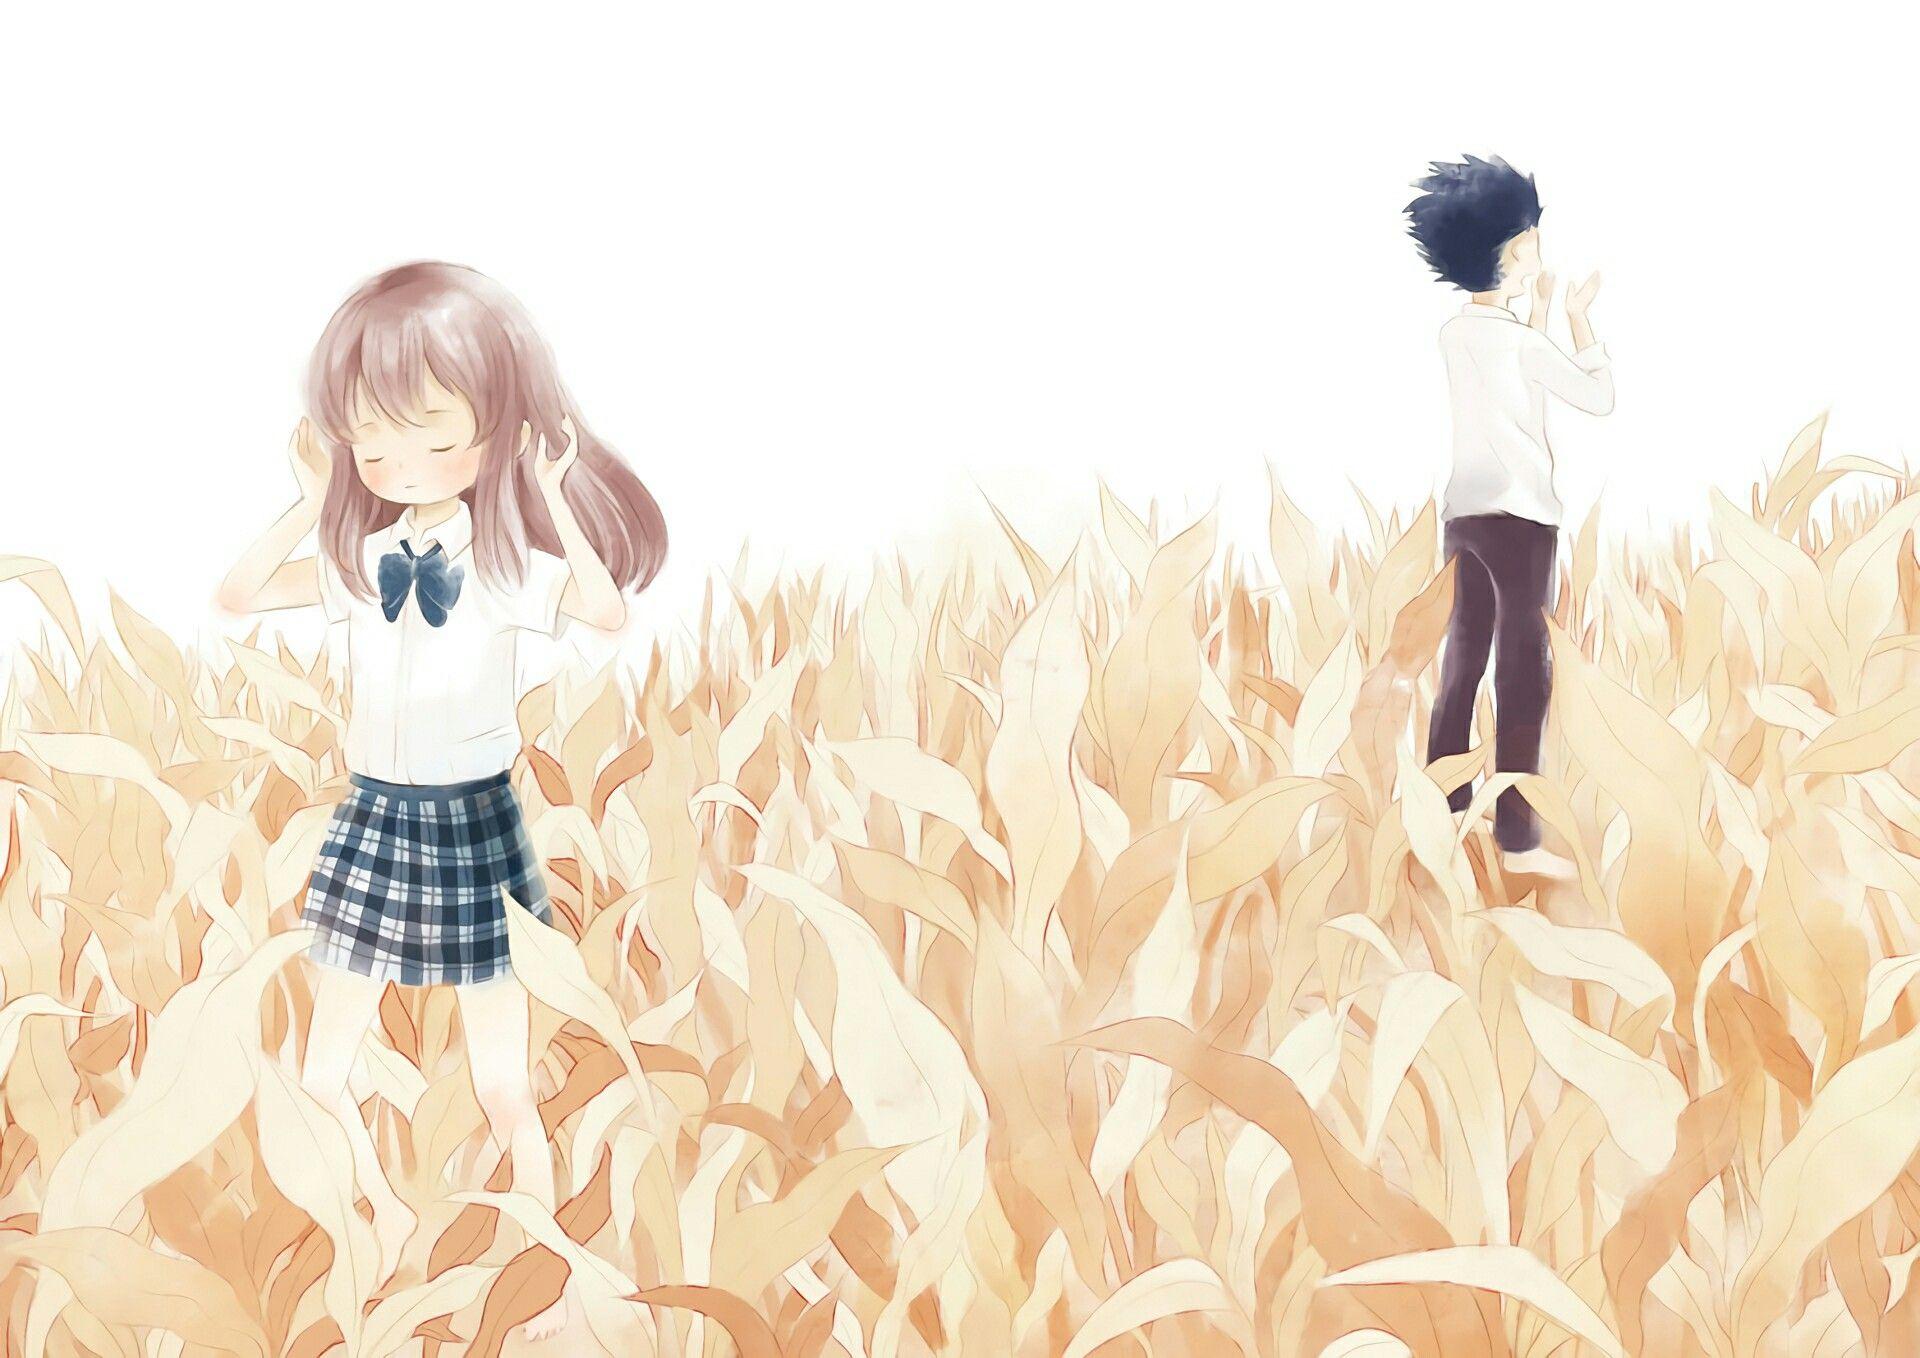 A Silent Voice, Koe no Katachi, Comedy, Drama, Romance